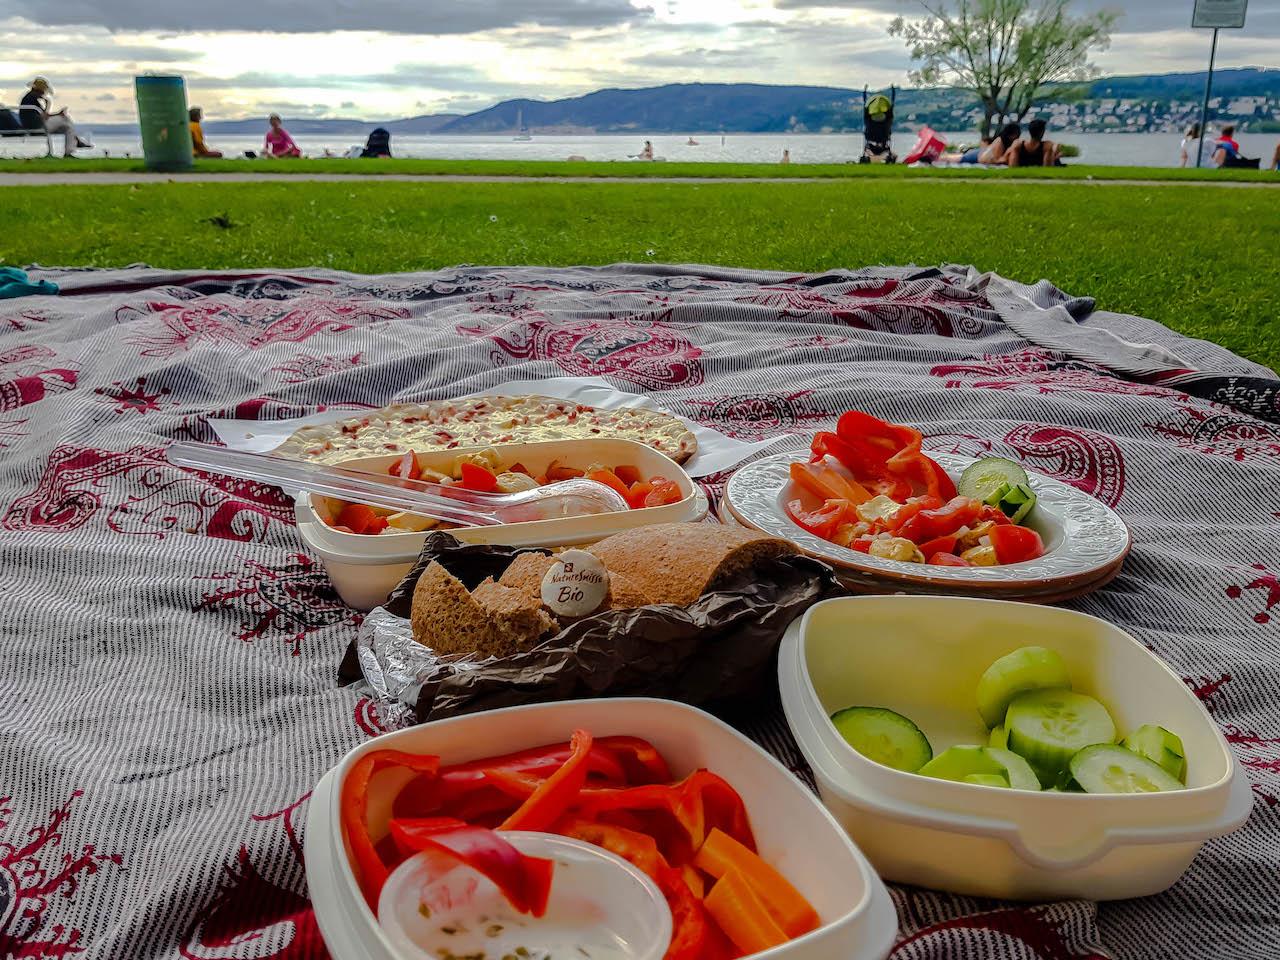 Picknick am Bodensee.